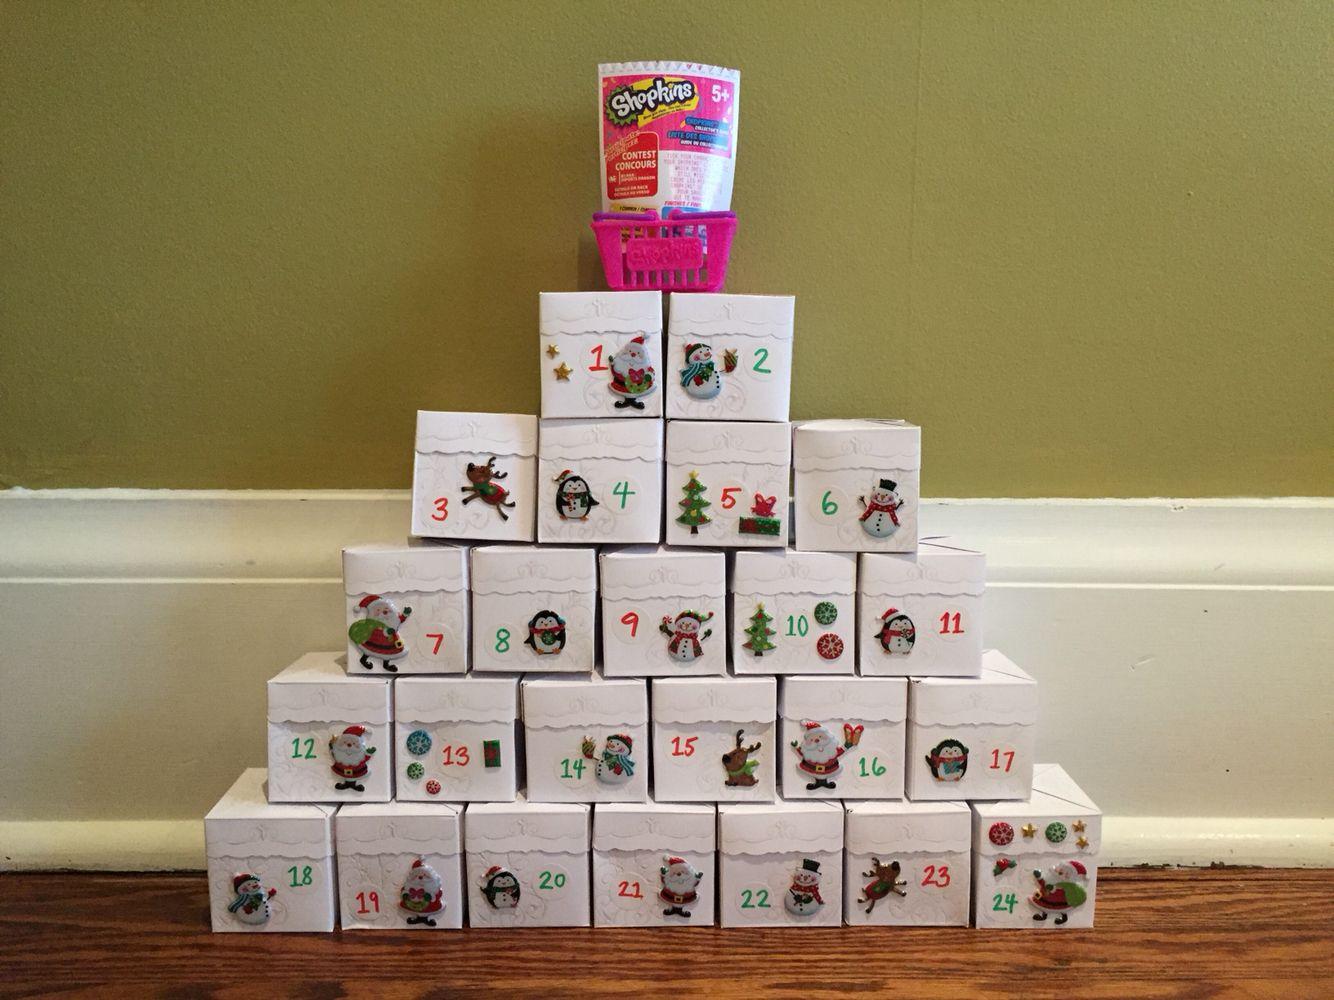 DIY Shopkins Advent Calendar 20 pack of Shopkins (plus